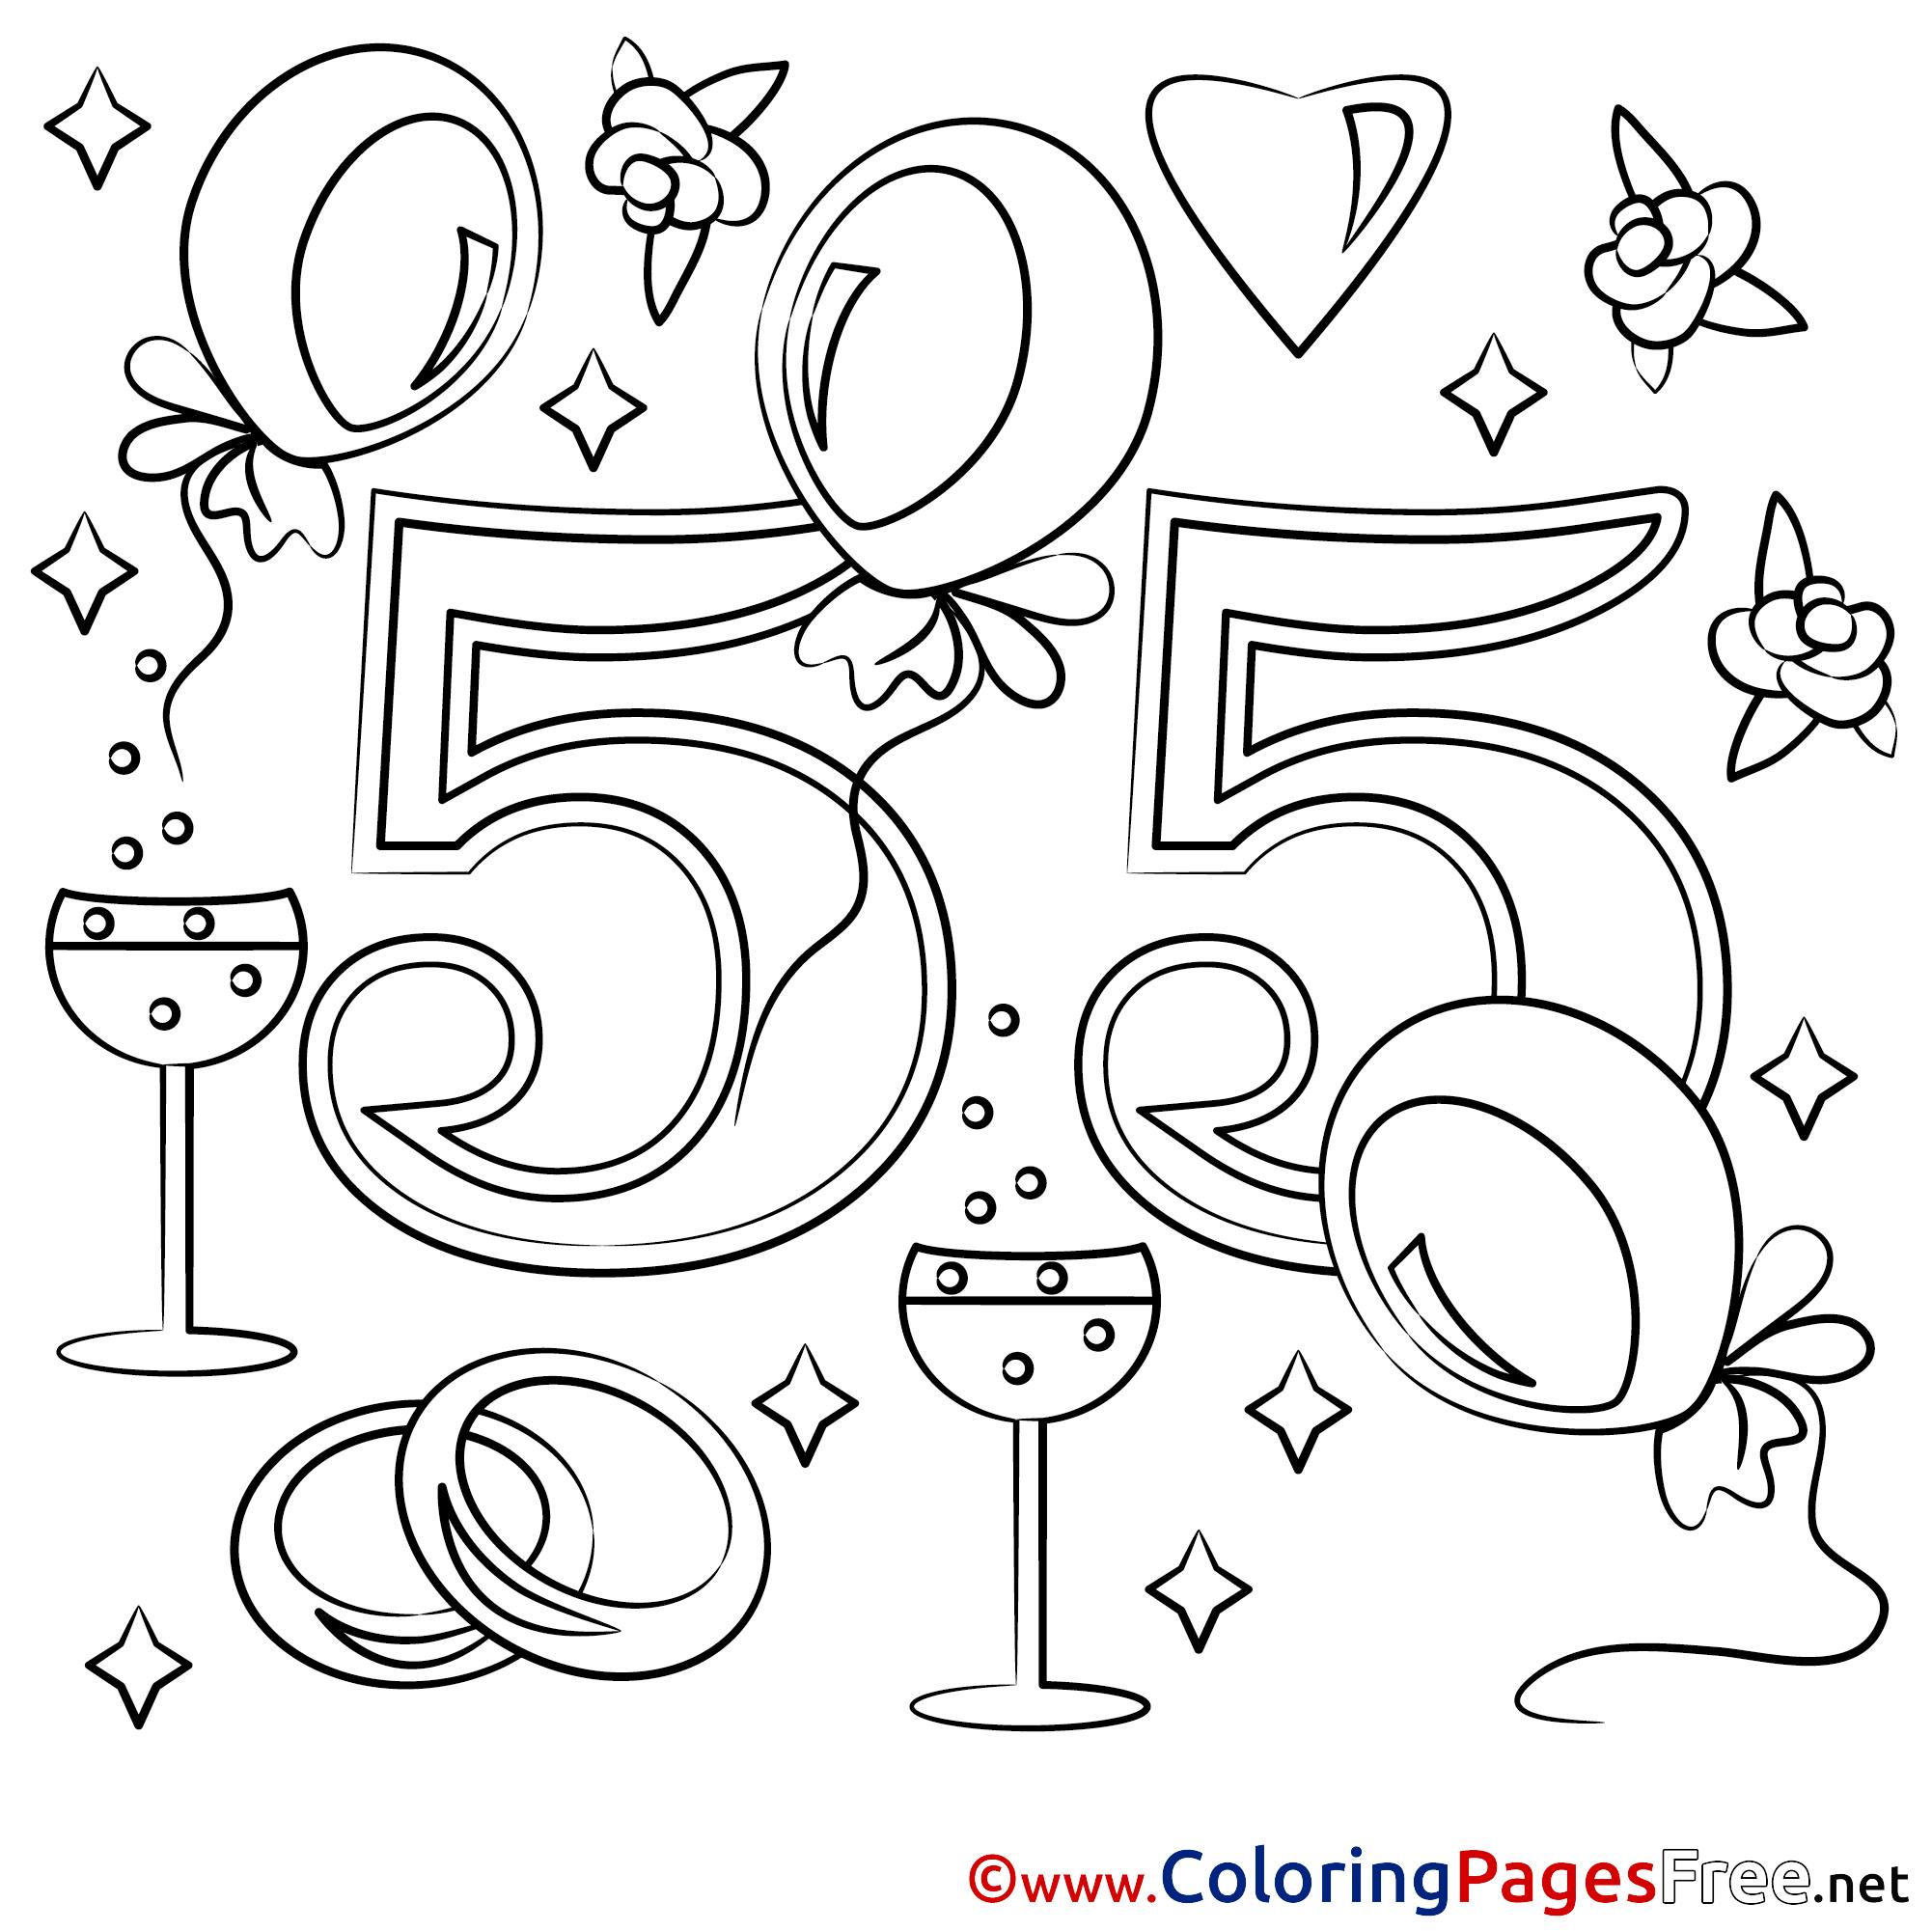 Printable coloring sheets wedding - Printable Coloring Sheets Wedding 41